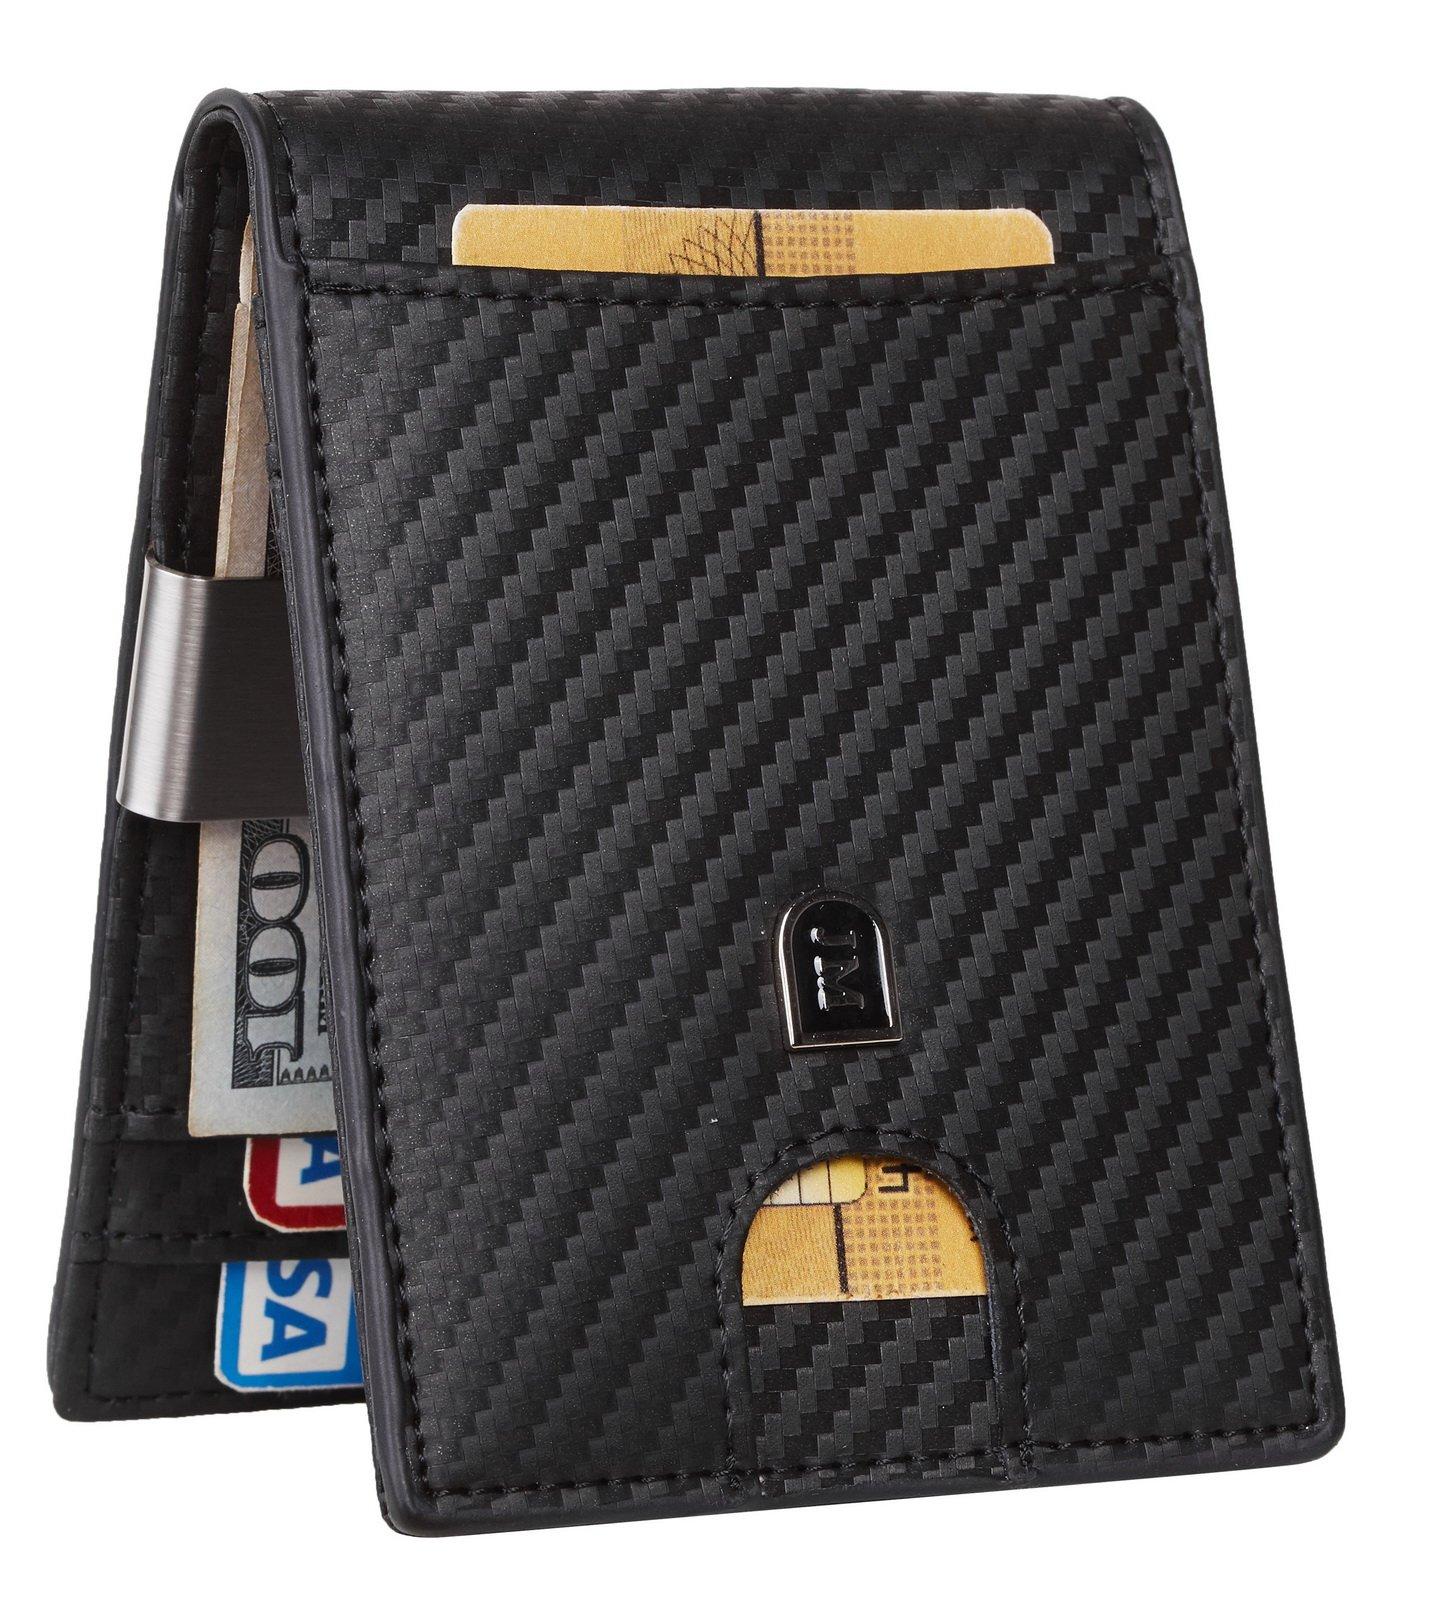 JM Mens Slim Bifold Wallet Money Clip RFID Blocking Travel Wallet Minimalist Credit Card Holder (carbon fiber black w/metal clip slim size)